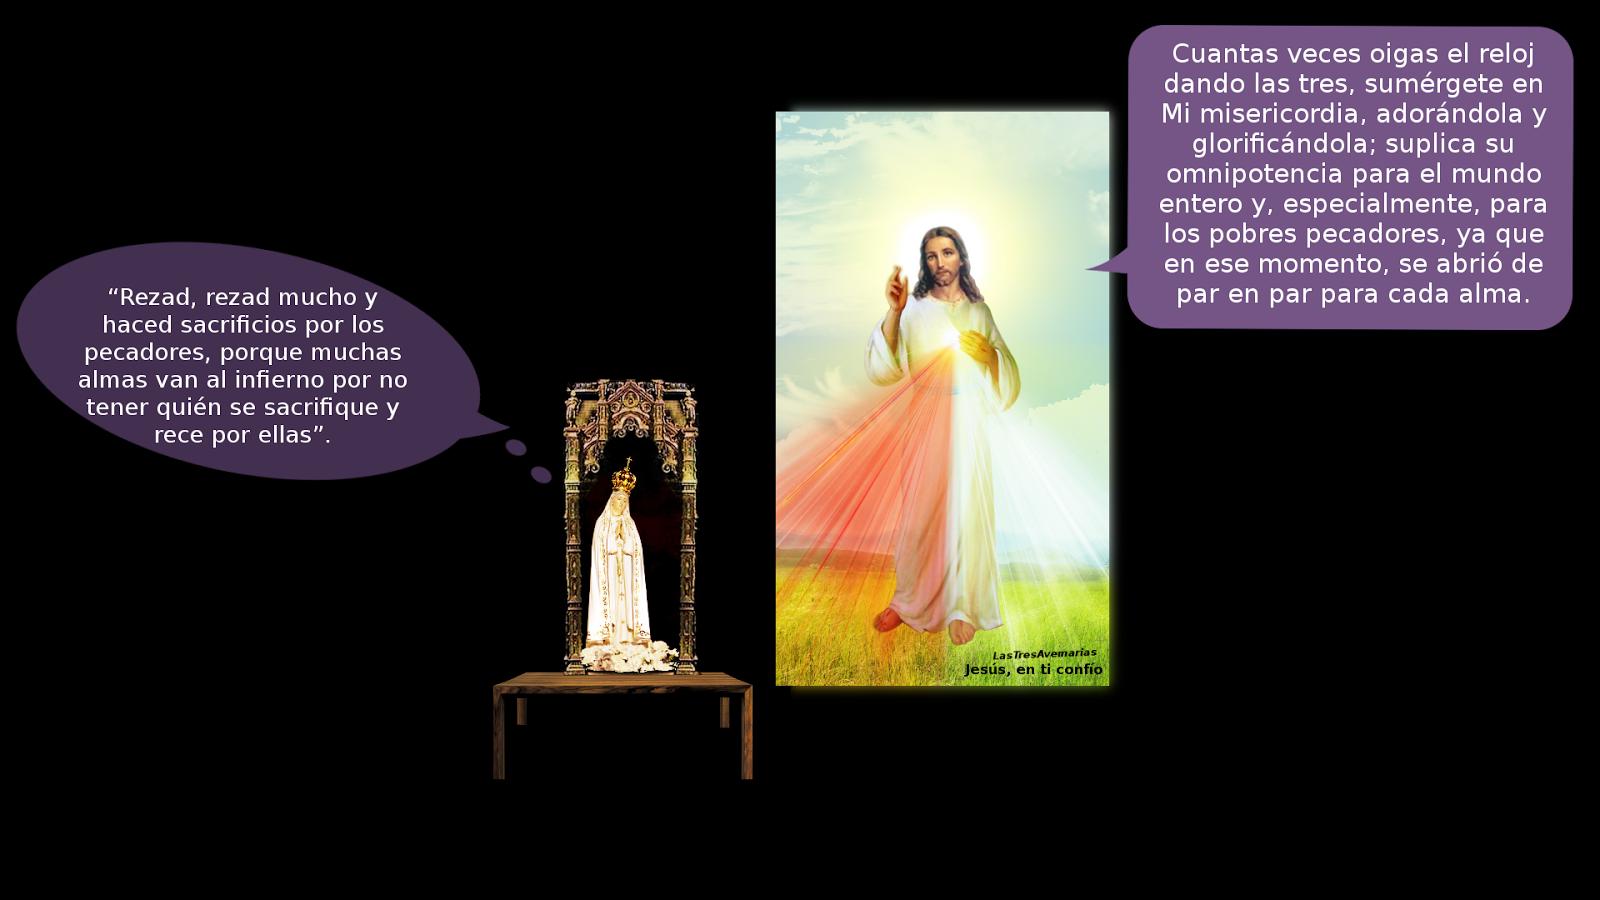 foto con jesus misericordioso y su amadisima madre